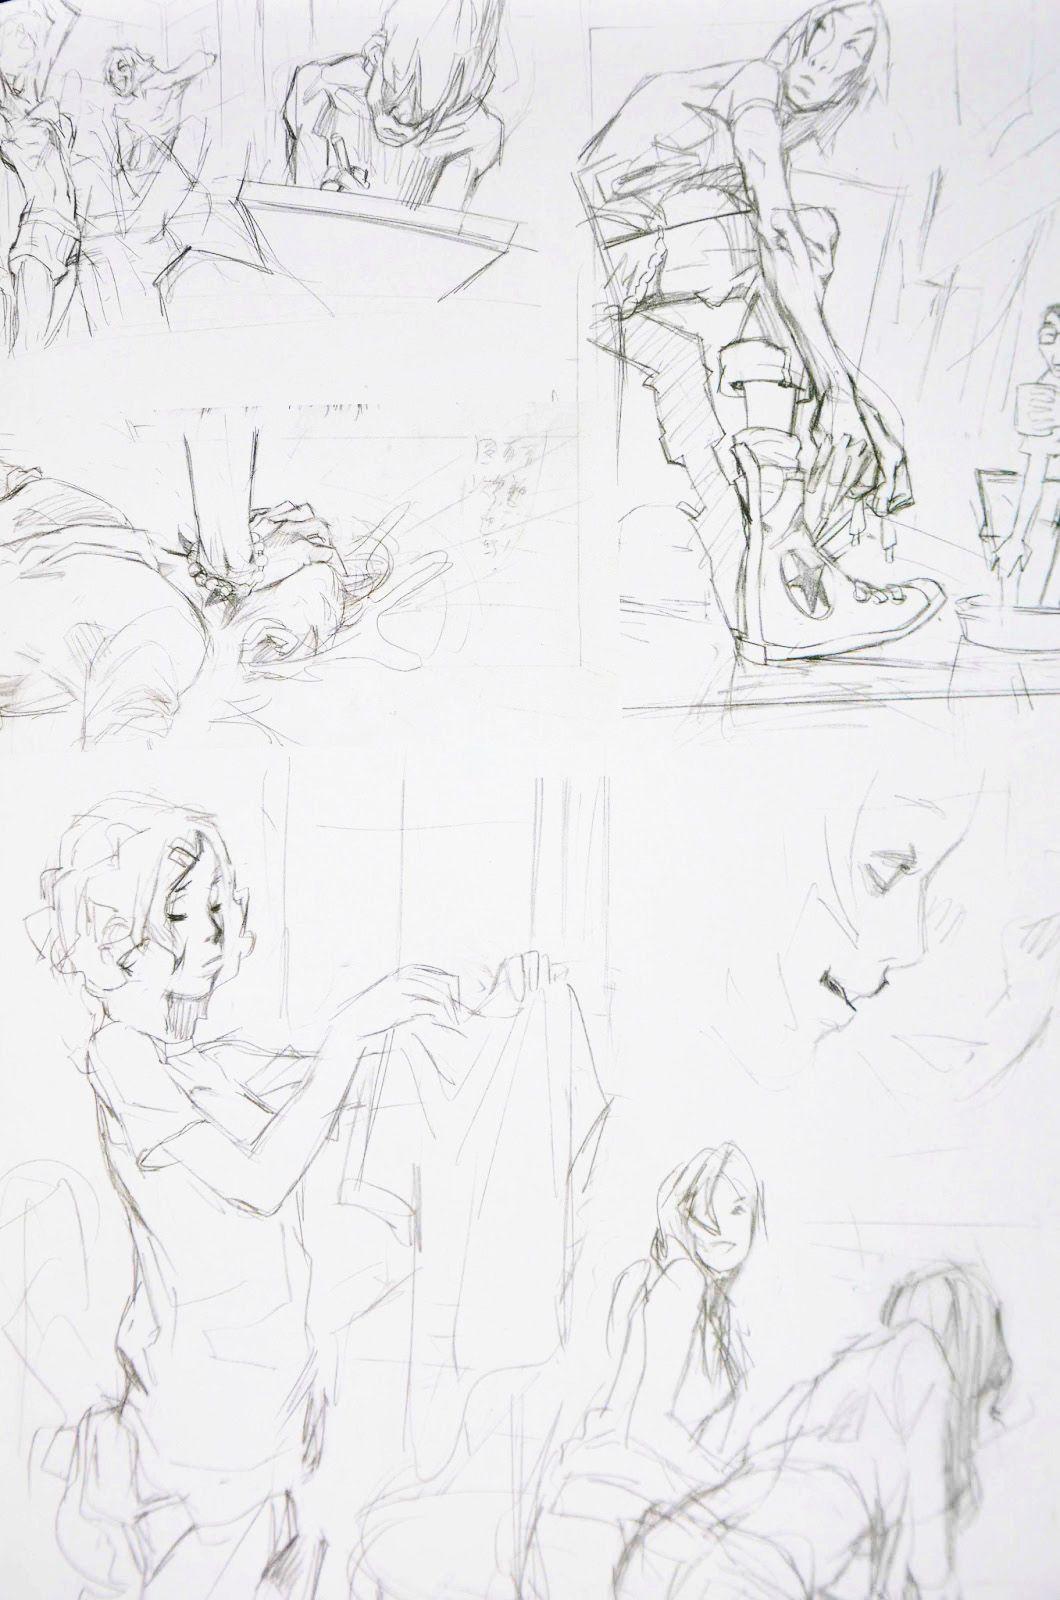 sketch | Benjamin Zhang Bin (本杰明)